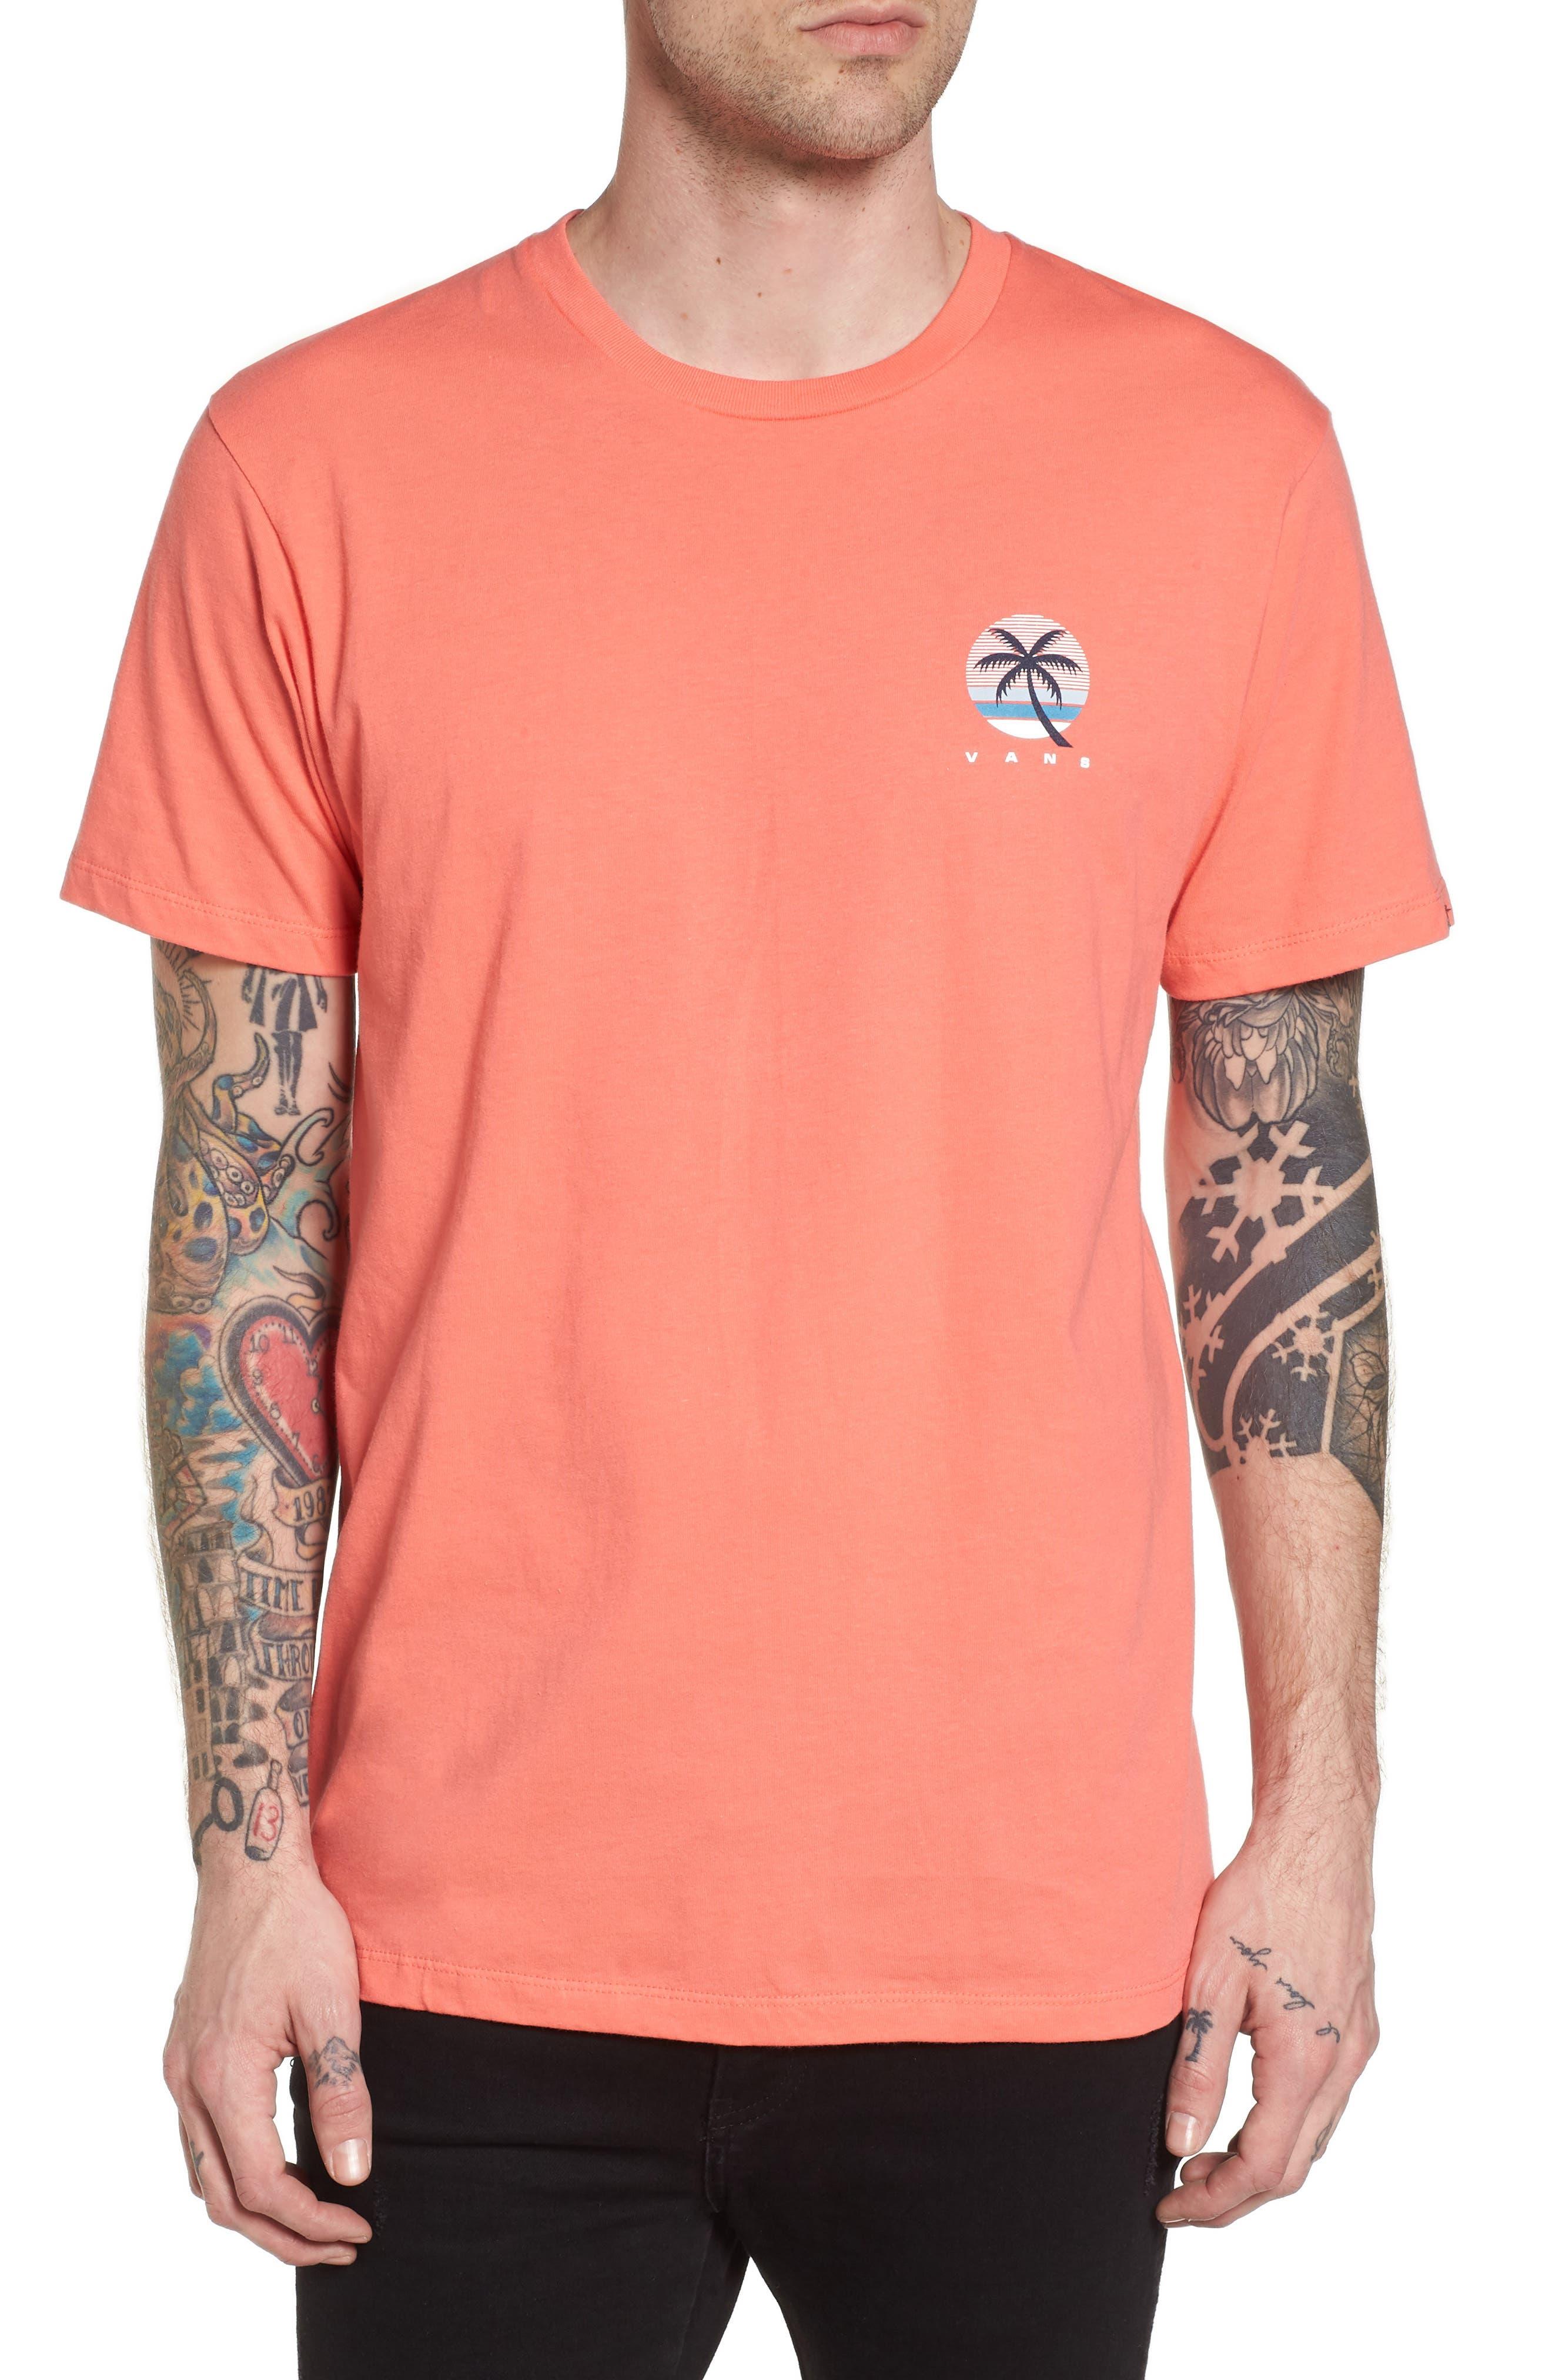 Vans Tall Palms Graphic T-Shirt